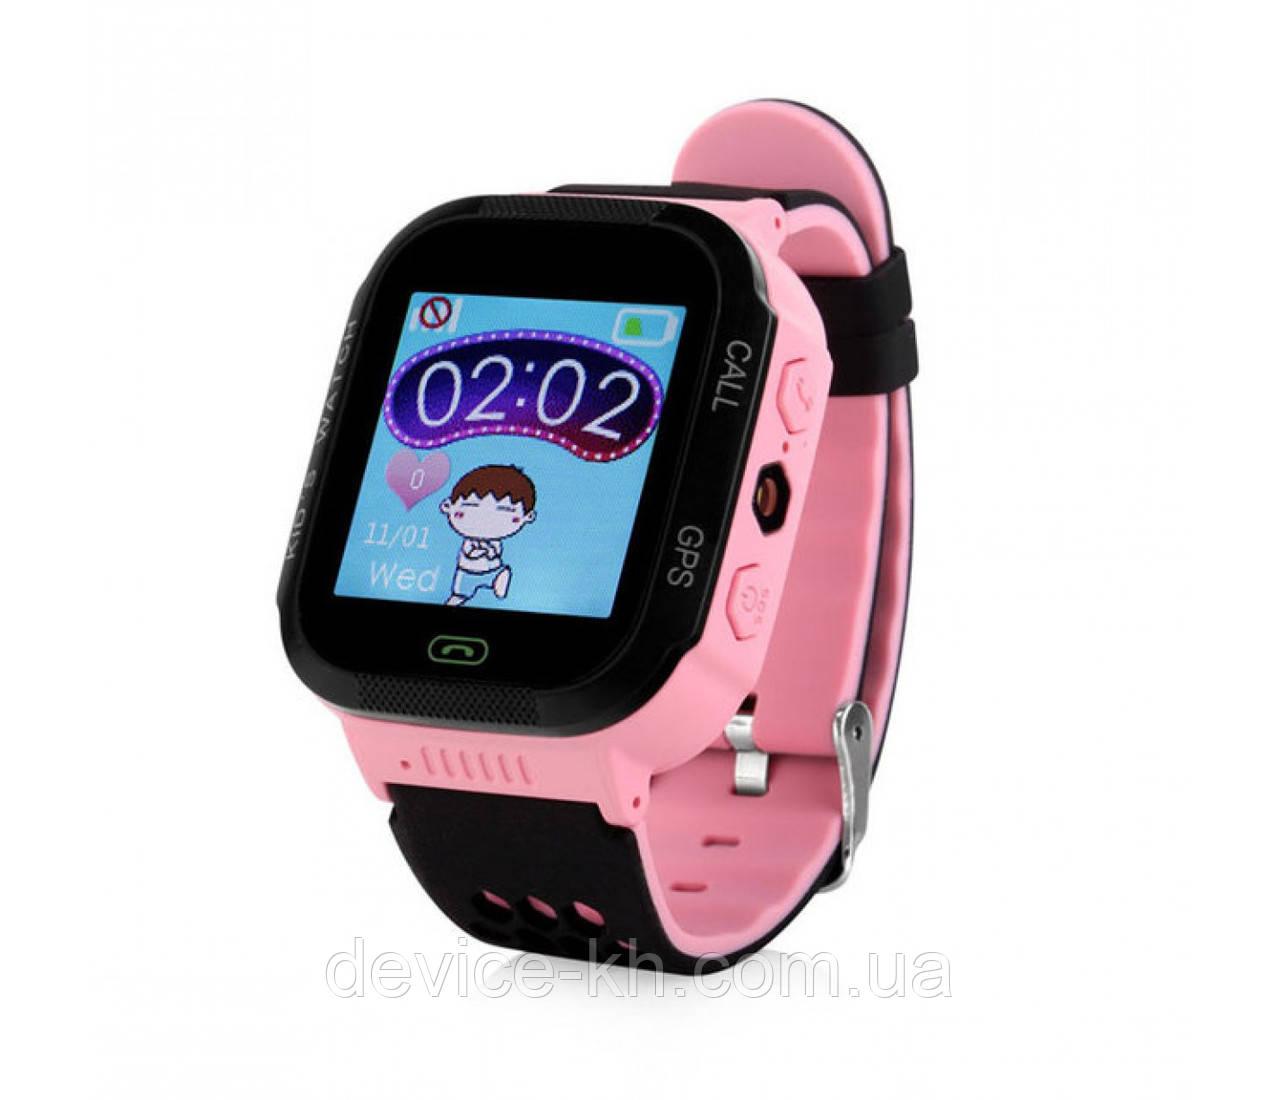 Детские Час Smart Baby Watch Z-3/A-25S c GPS Трекером